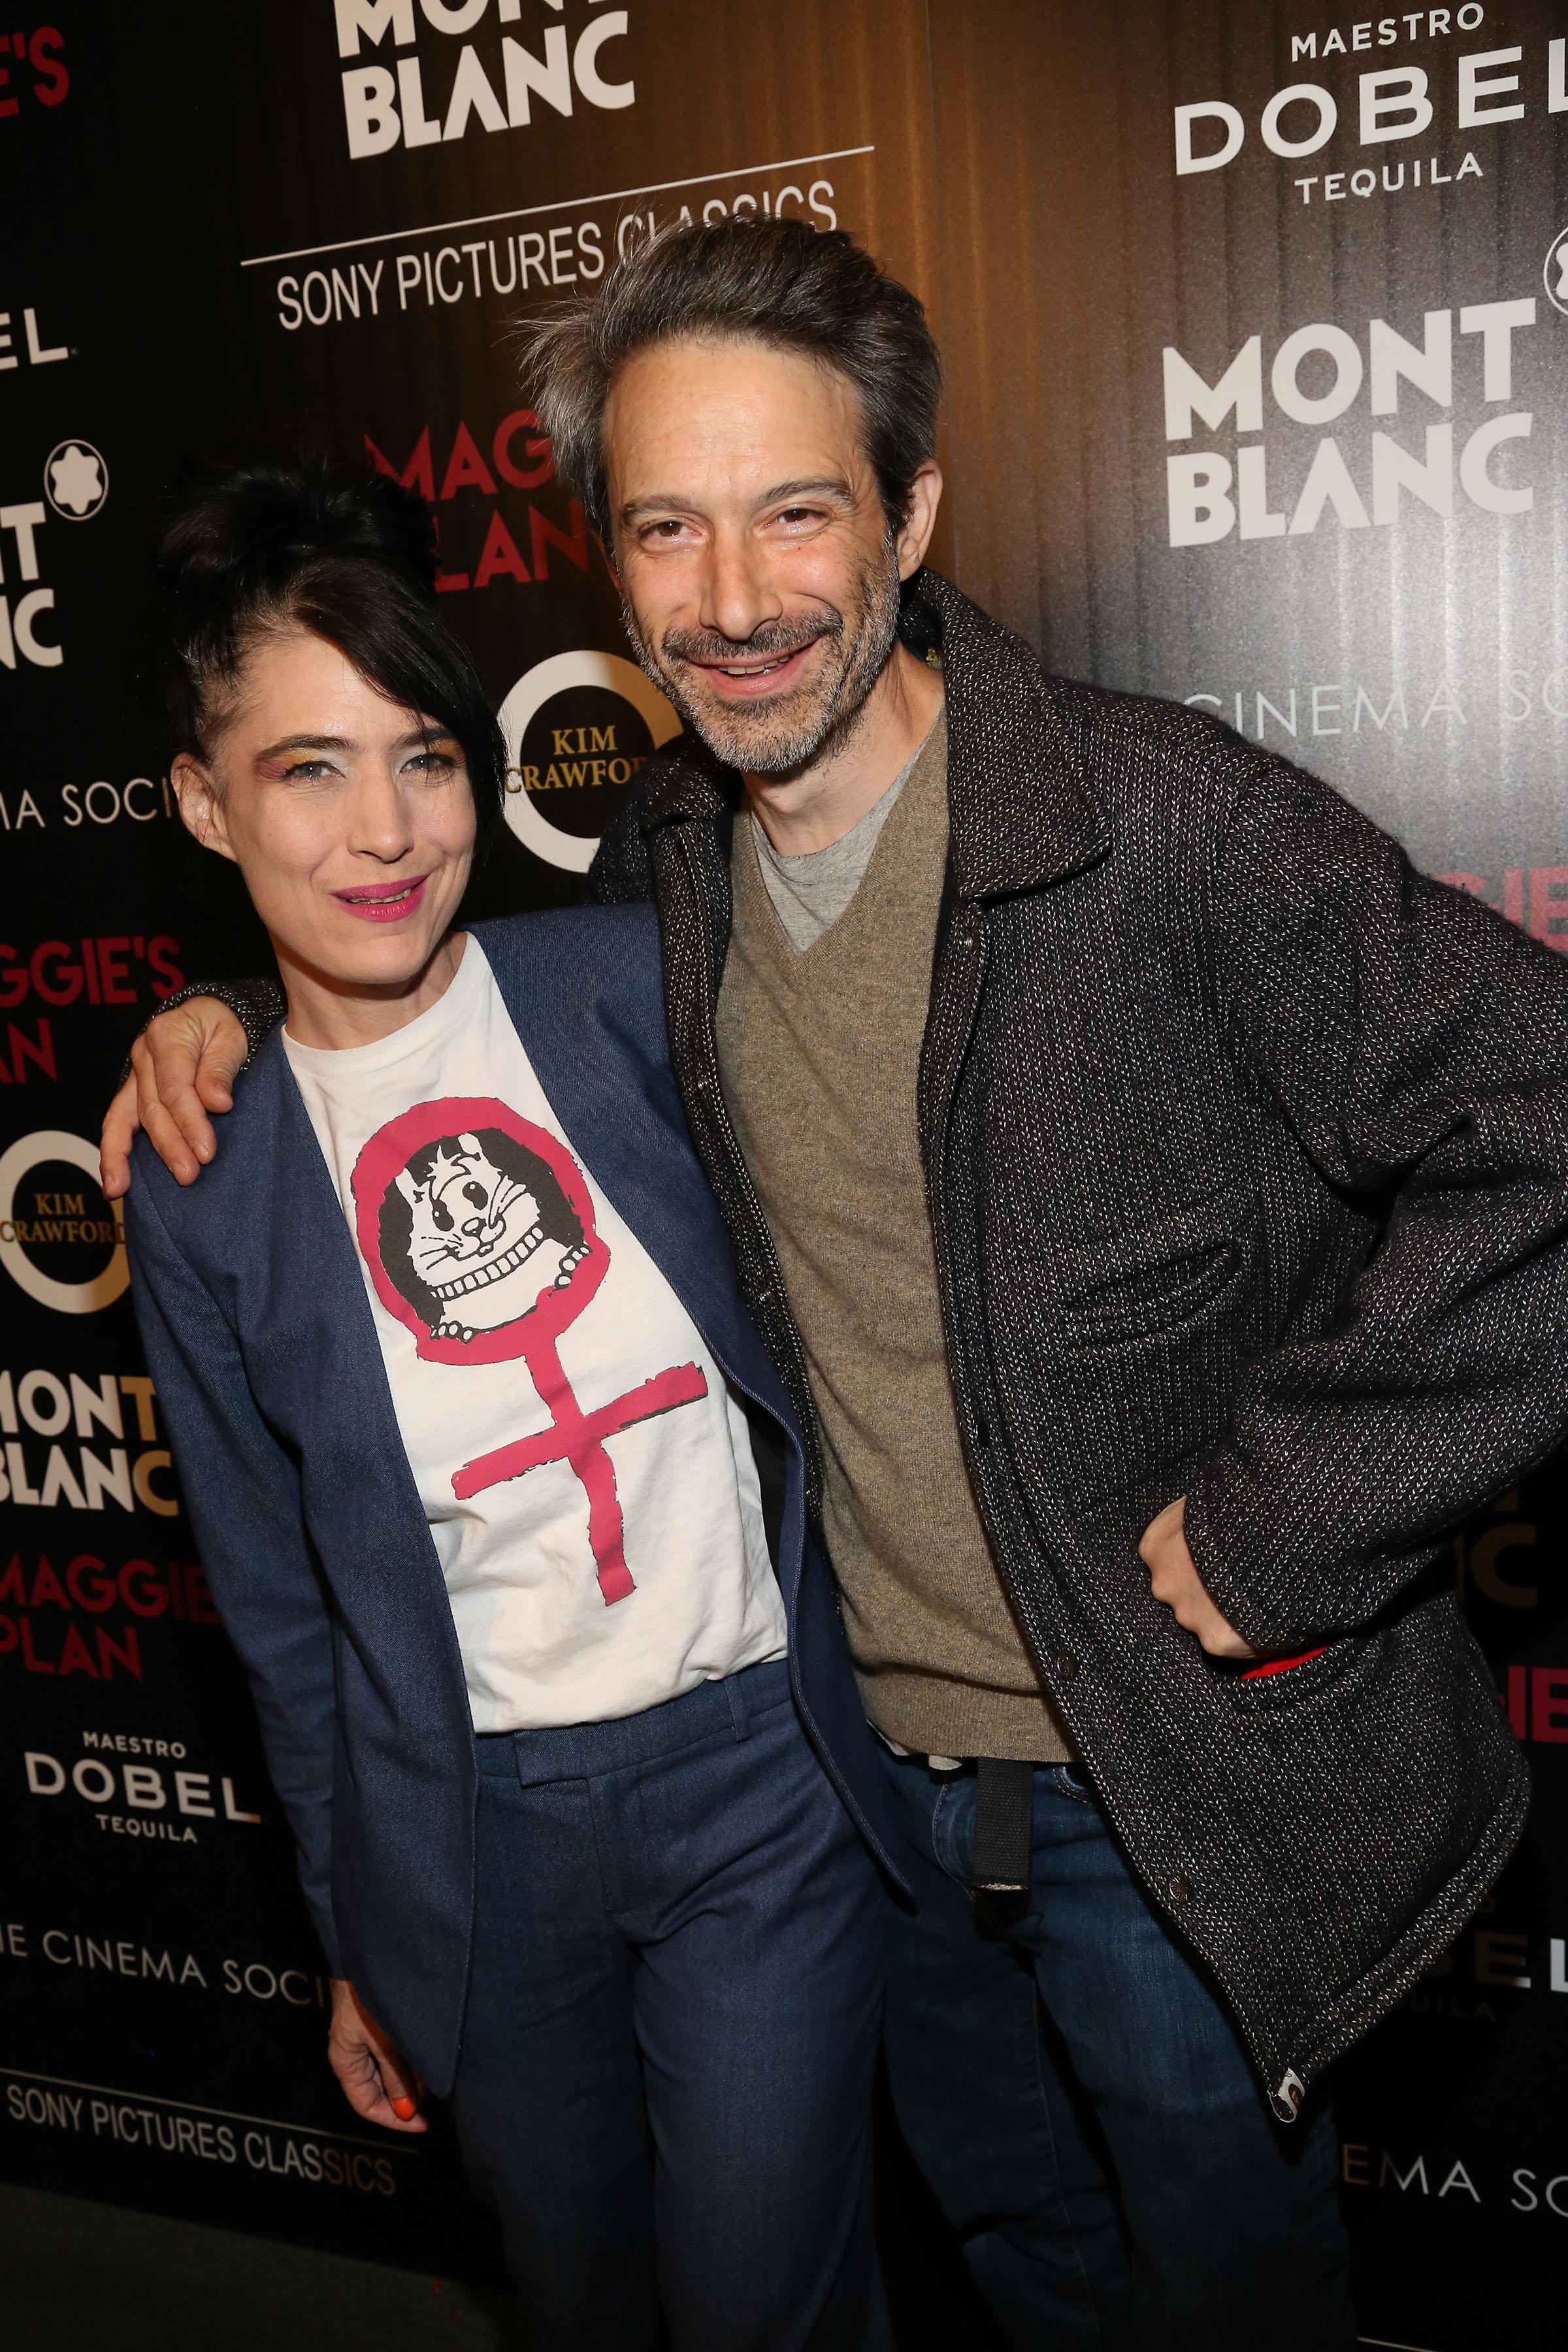 Kathleen Hanna Adam Horovitz Montblanc And The Cinema Society With Mastro Dobel